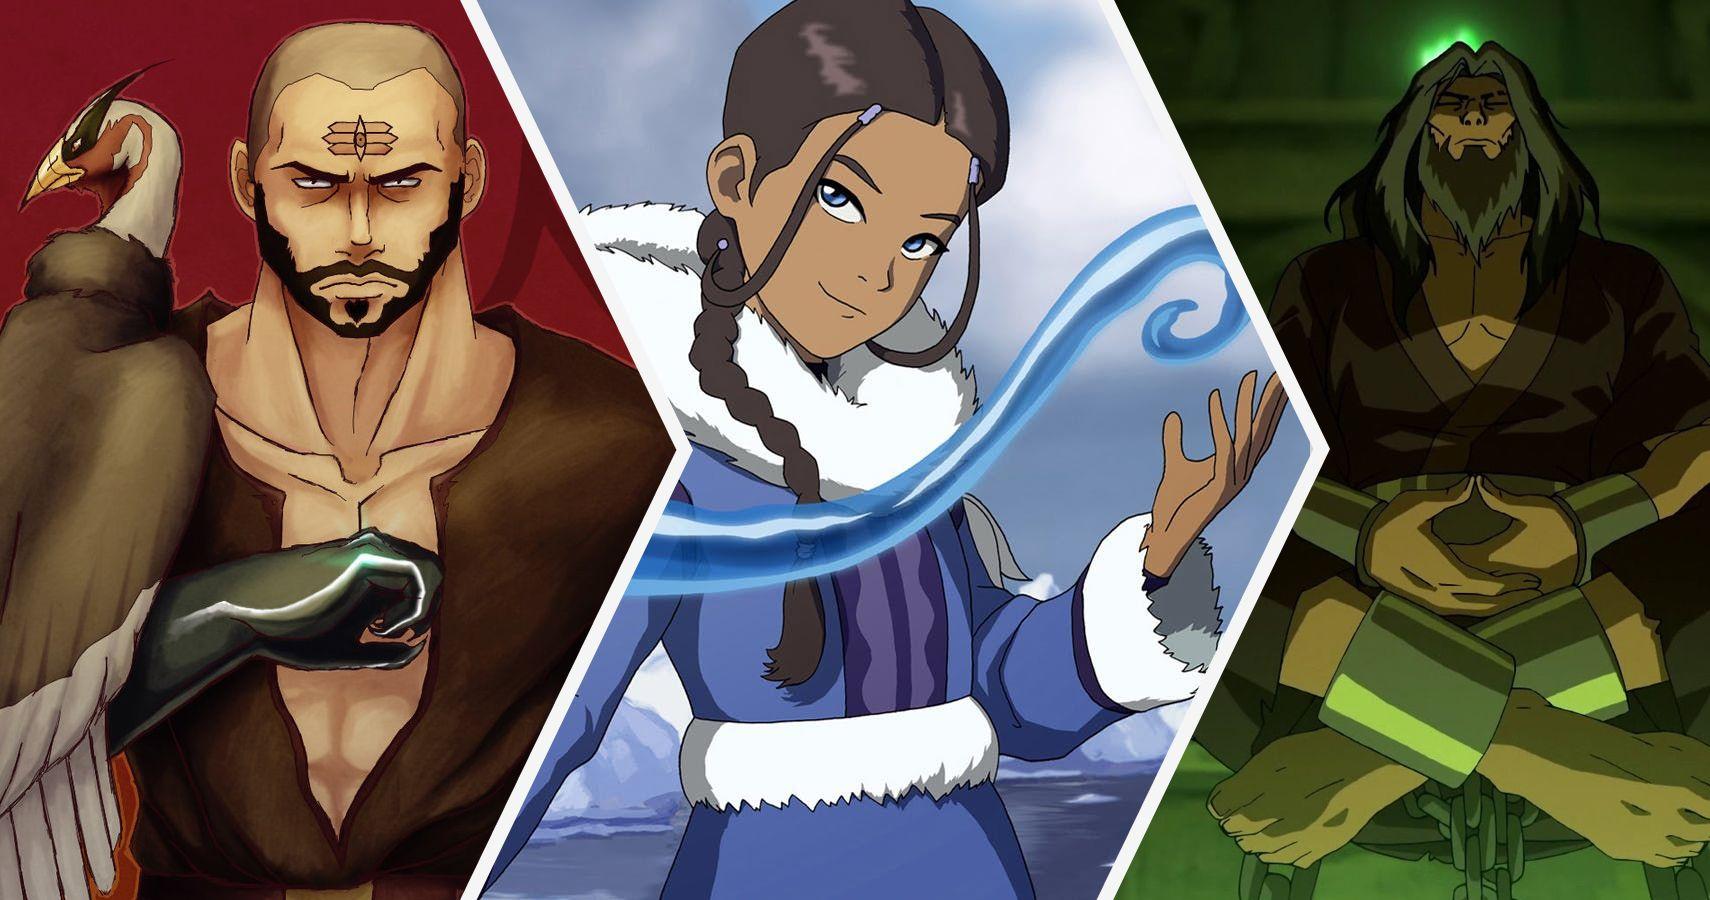 Avatar The Last Airbender Desktop Wallpapers Free Download